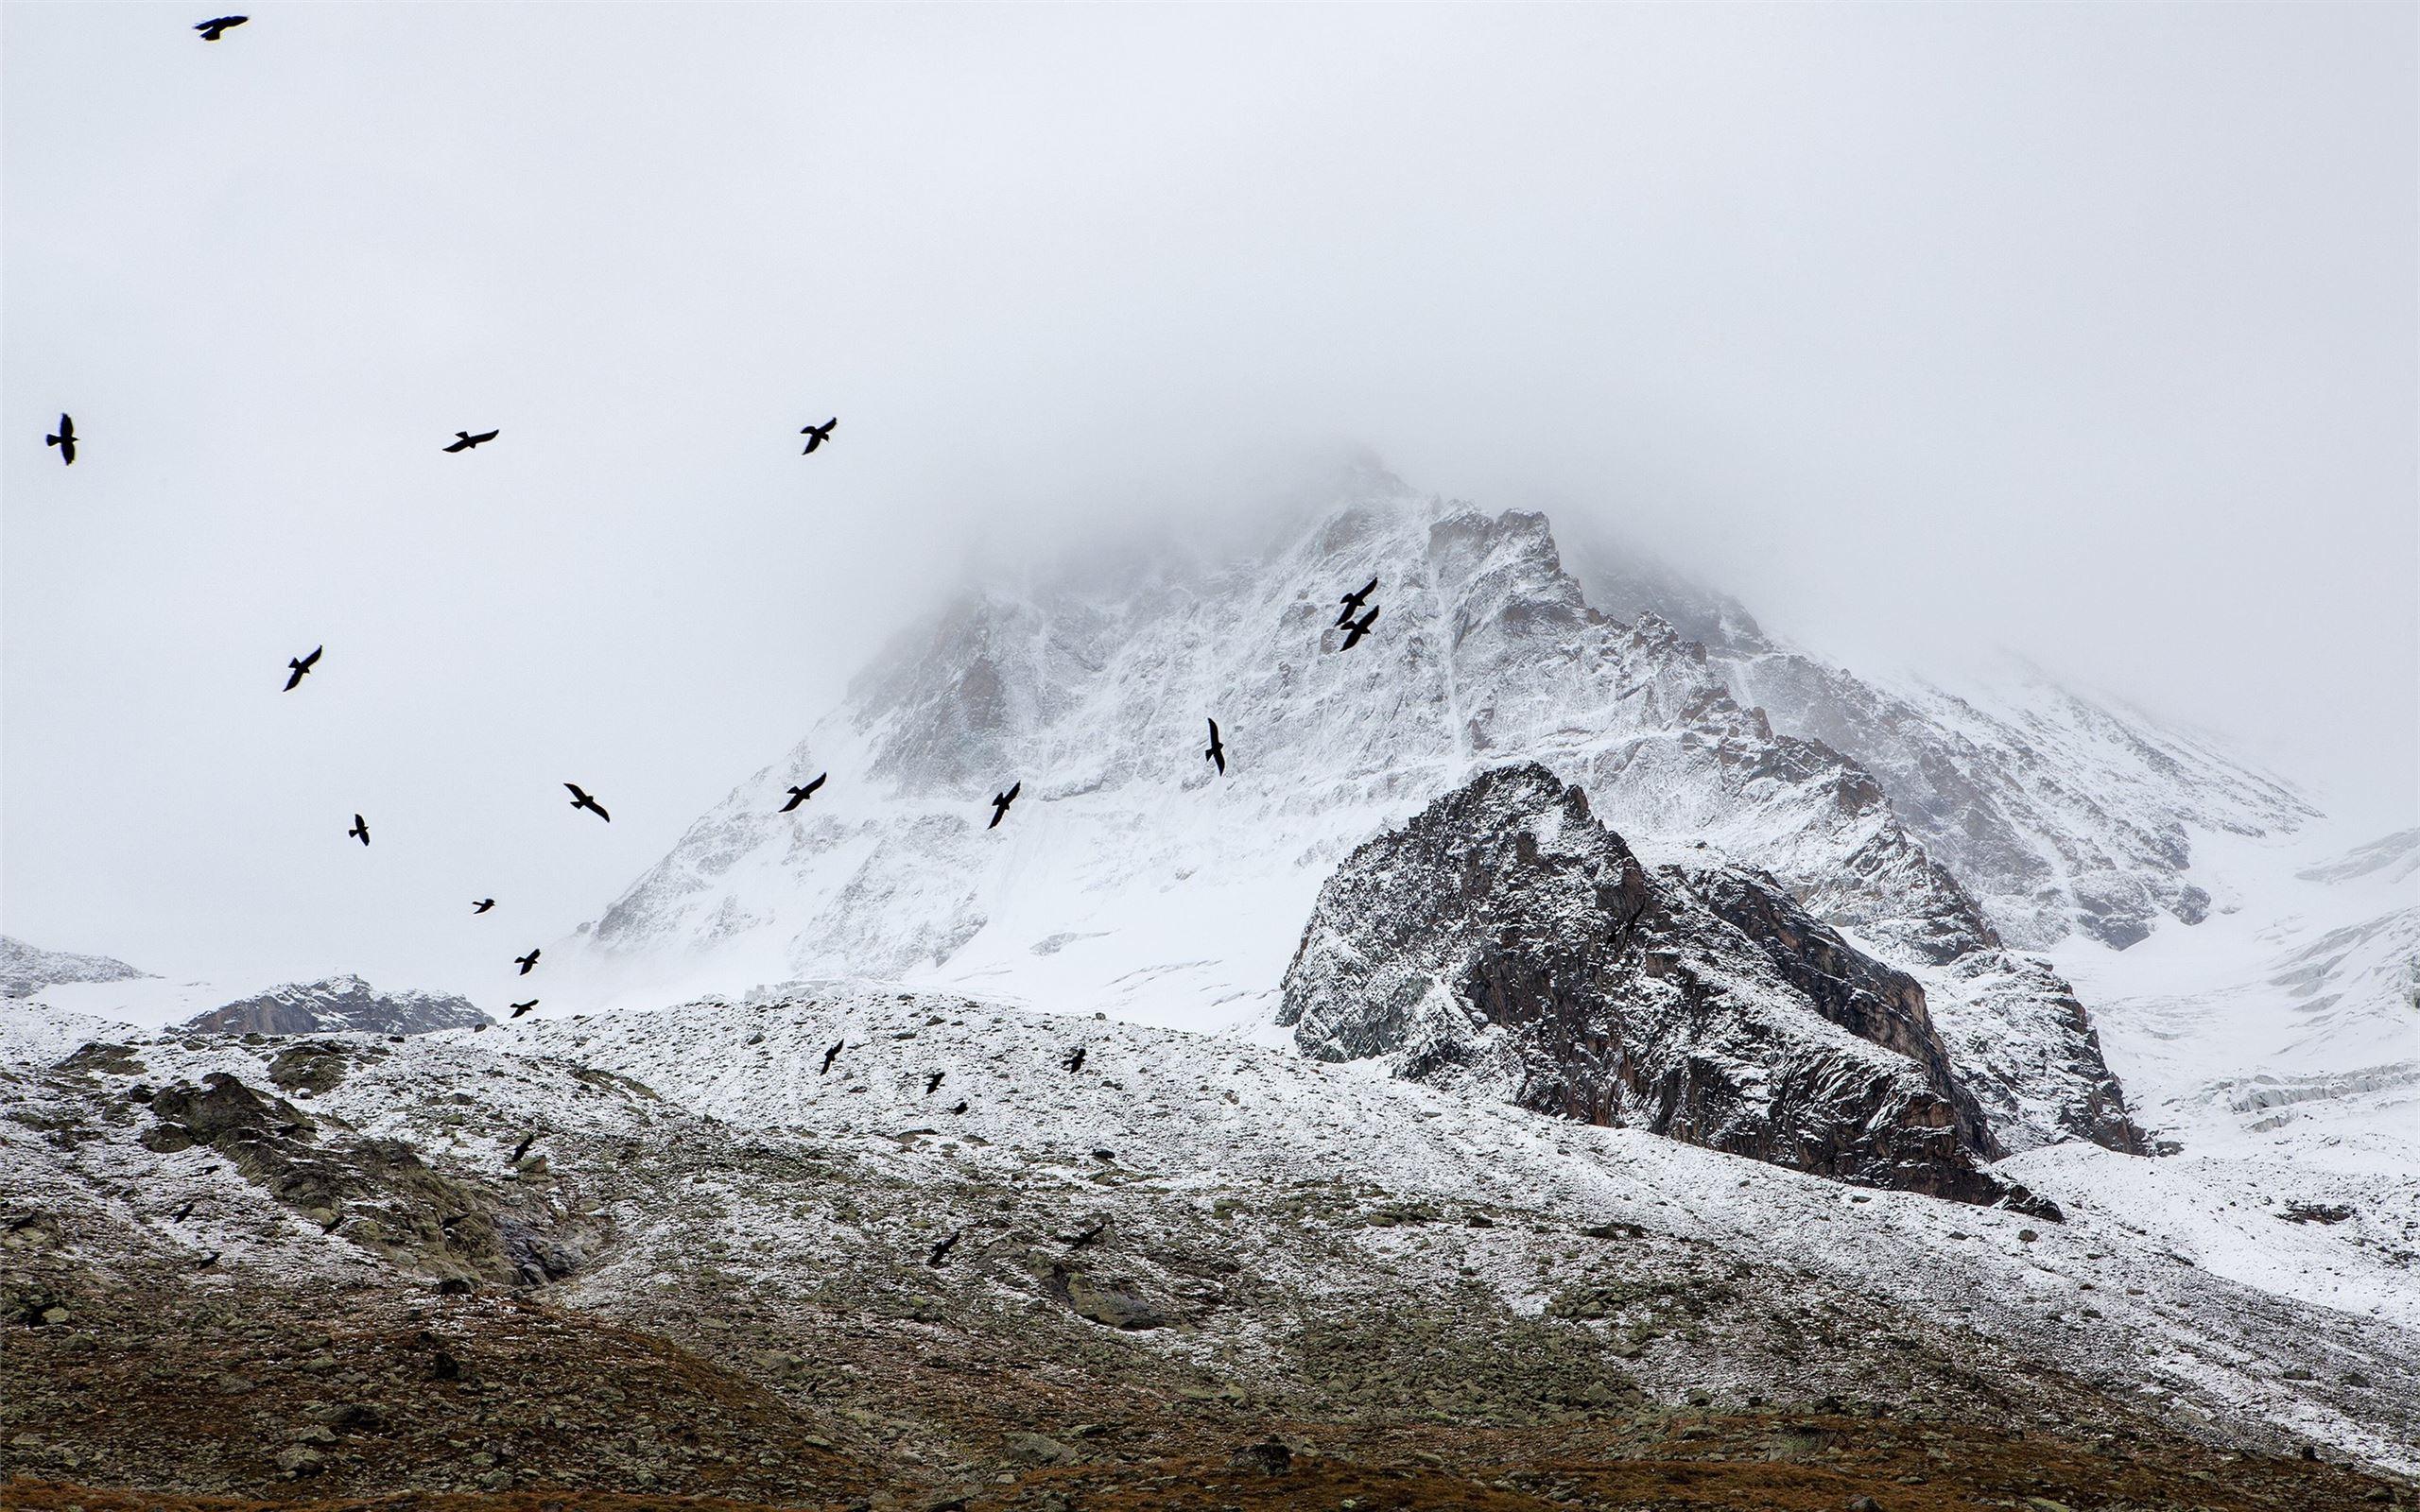 Birds Flocking In The Alp Mac Wallpaper Download Allmacwallpaper Images, Photos, Reviews